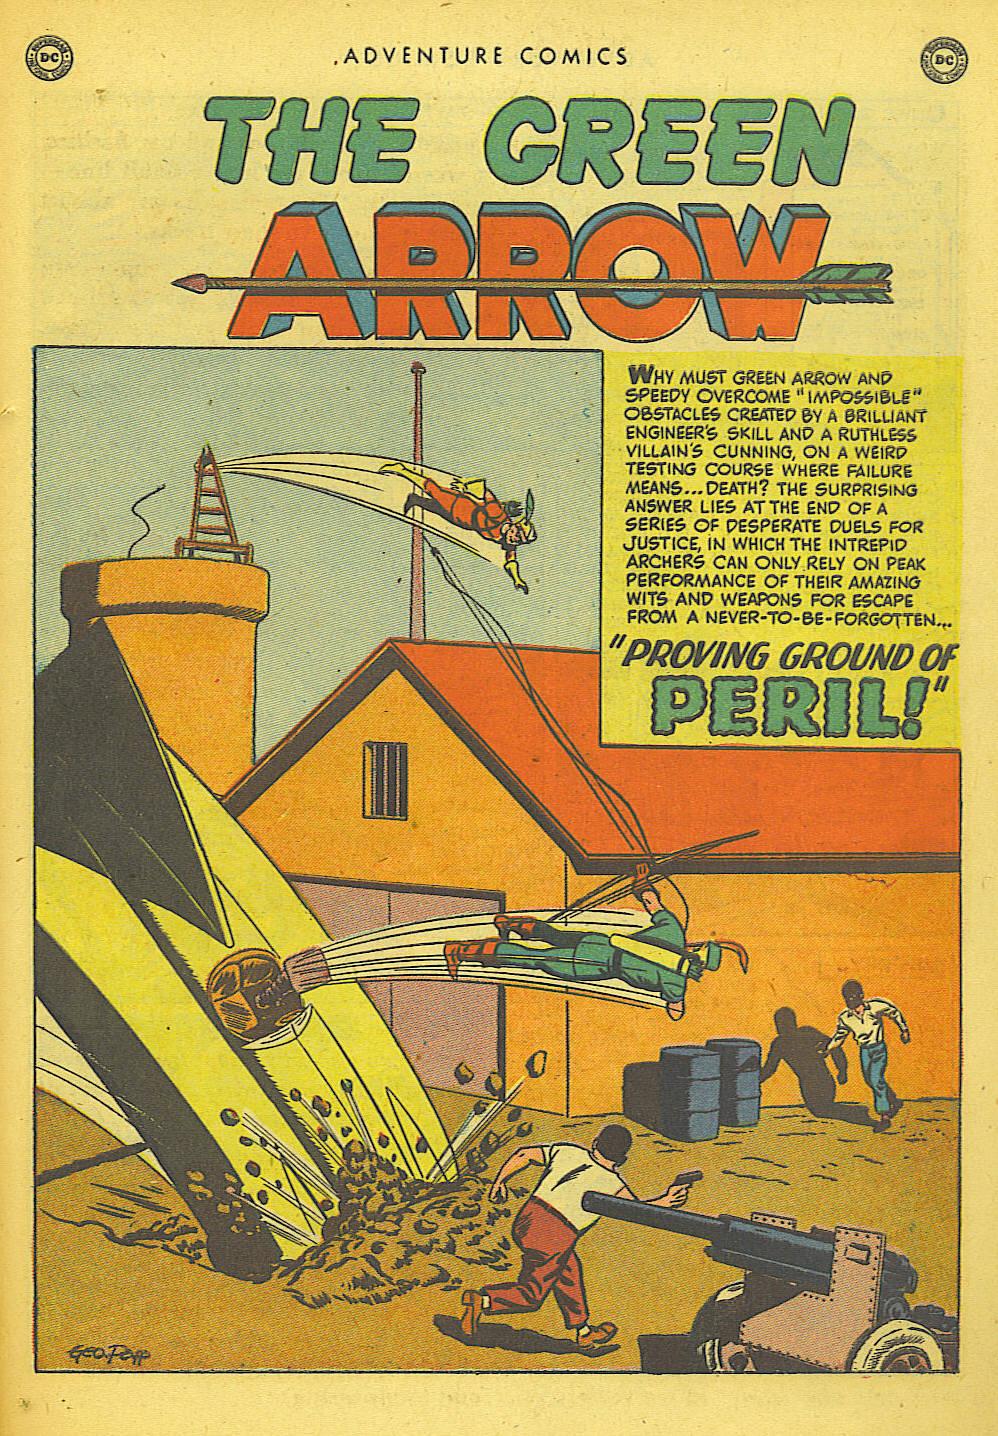 Read online Adventure Comics (1938) comic -  Issue #155 - 39